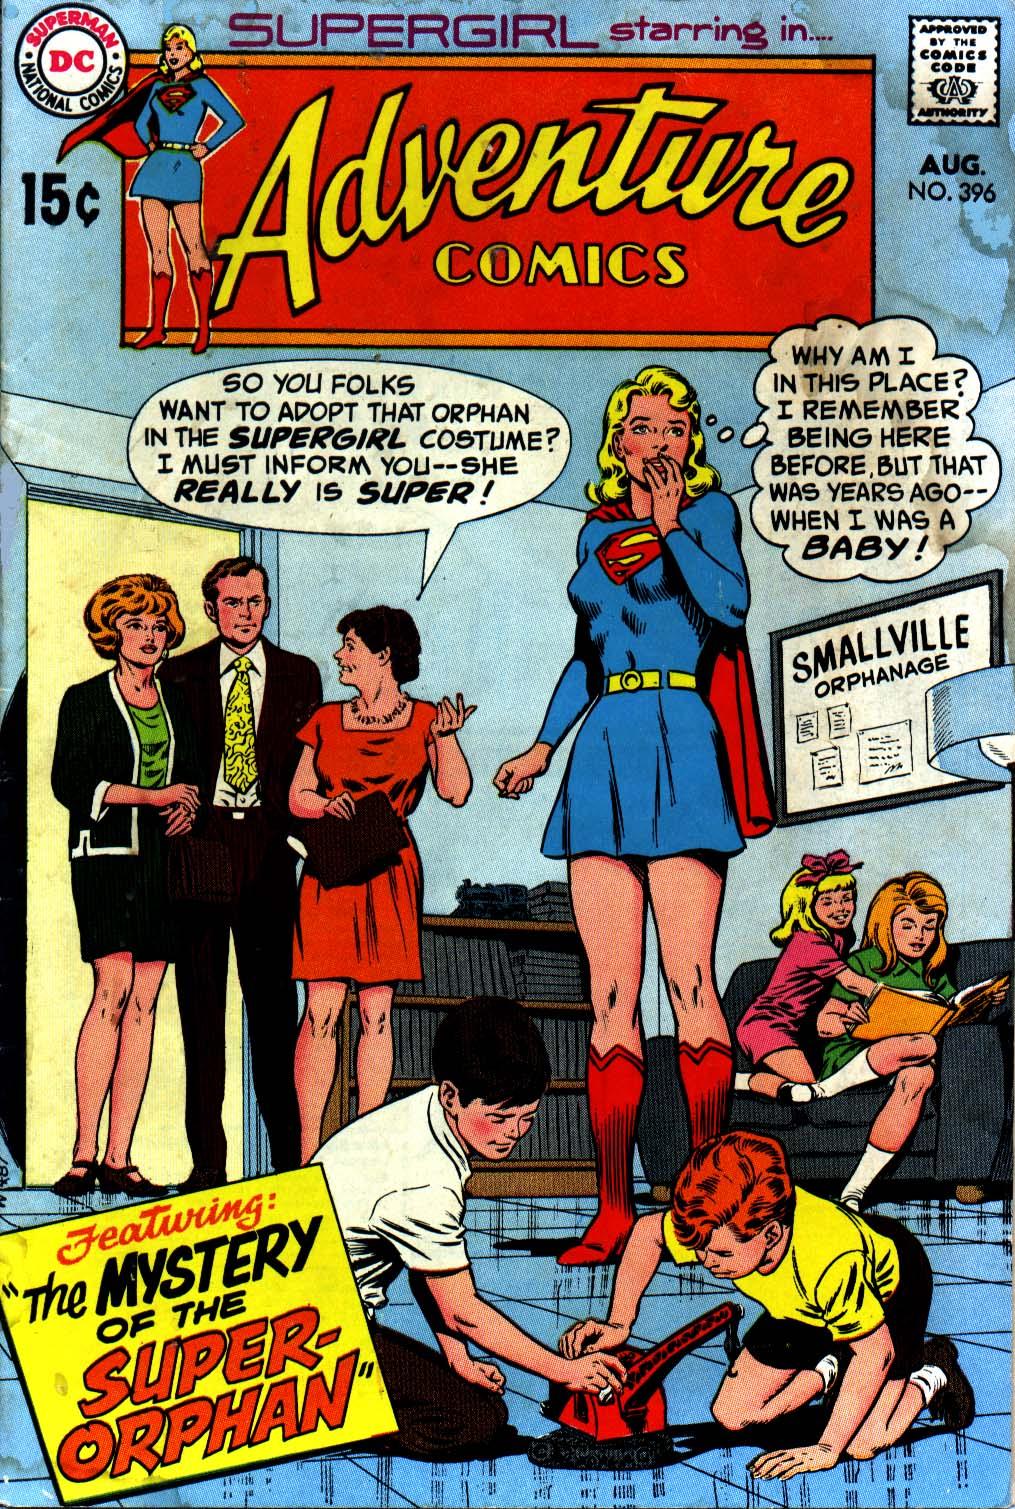 Read online Adventure Comics (1938) comic -  Issue #396 - 1